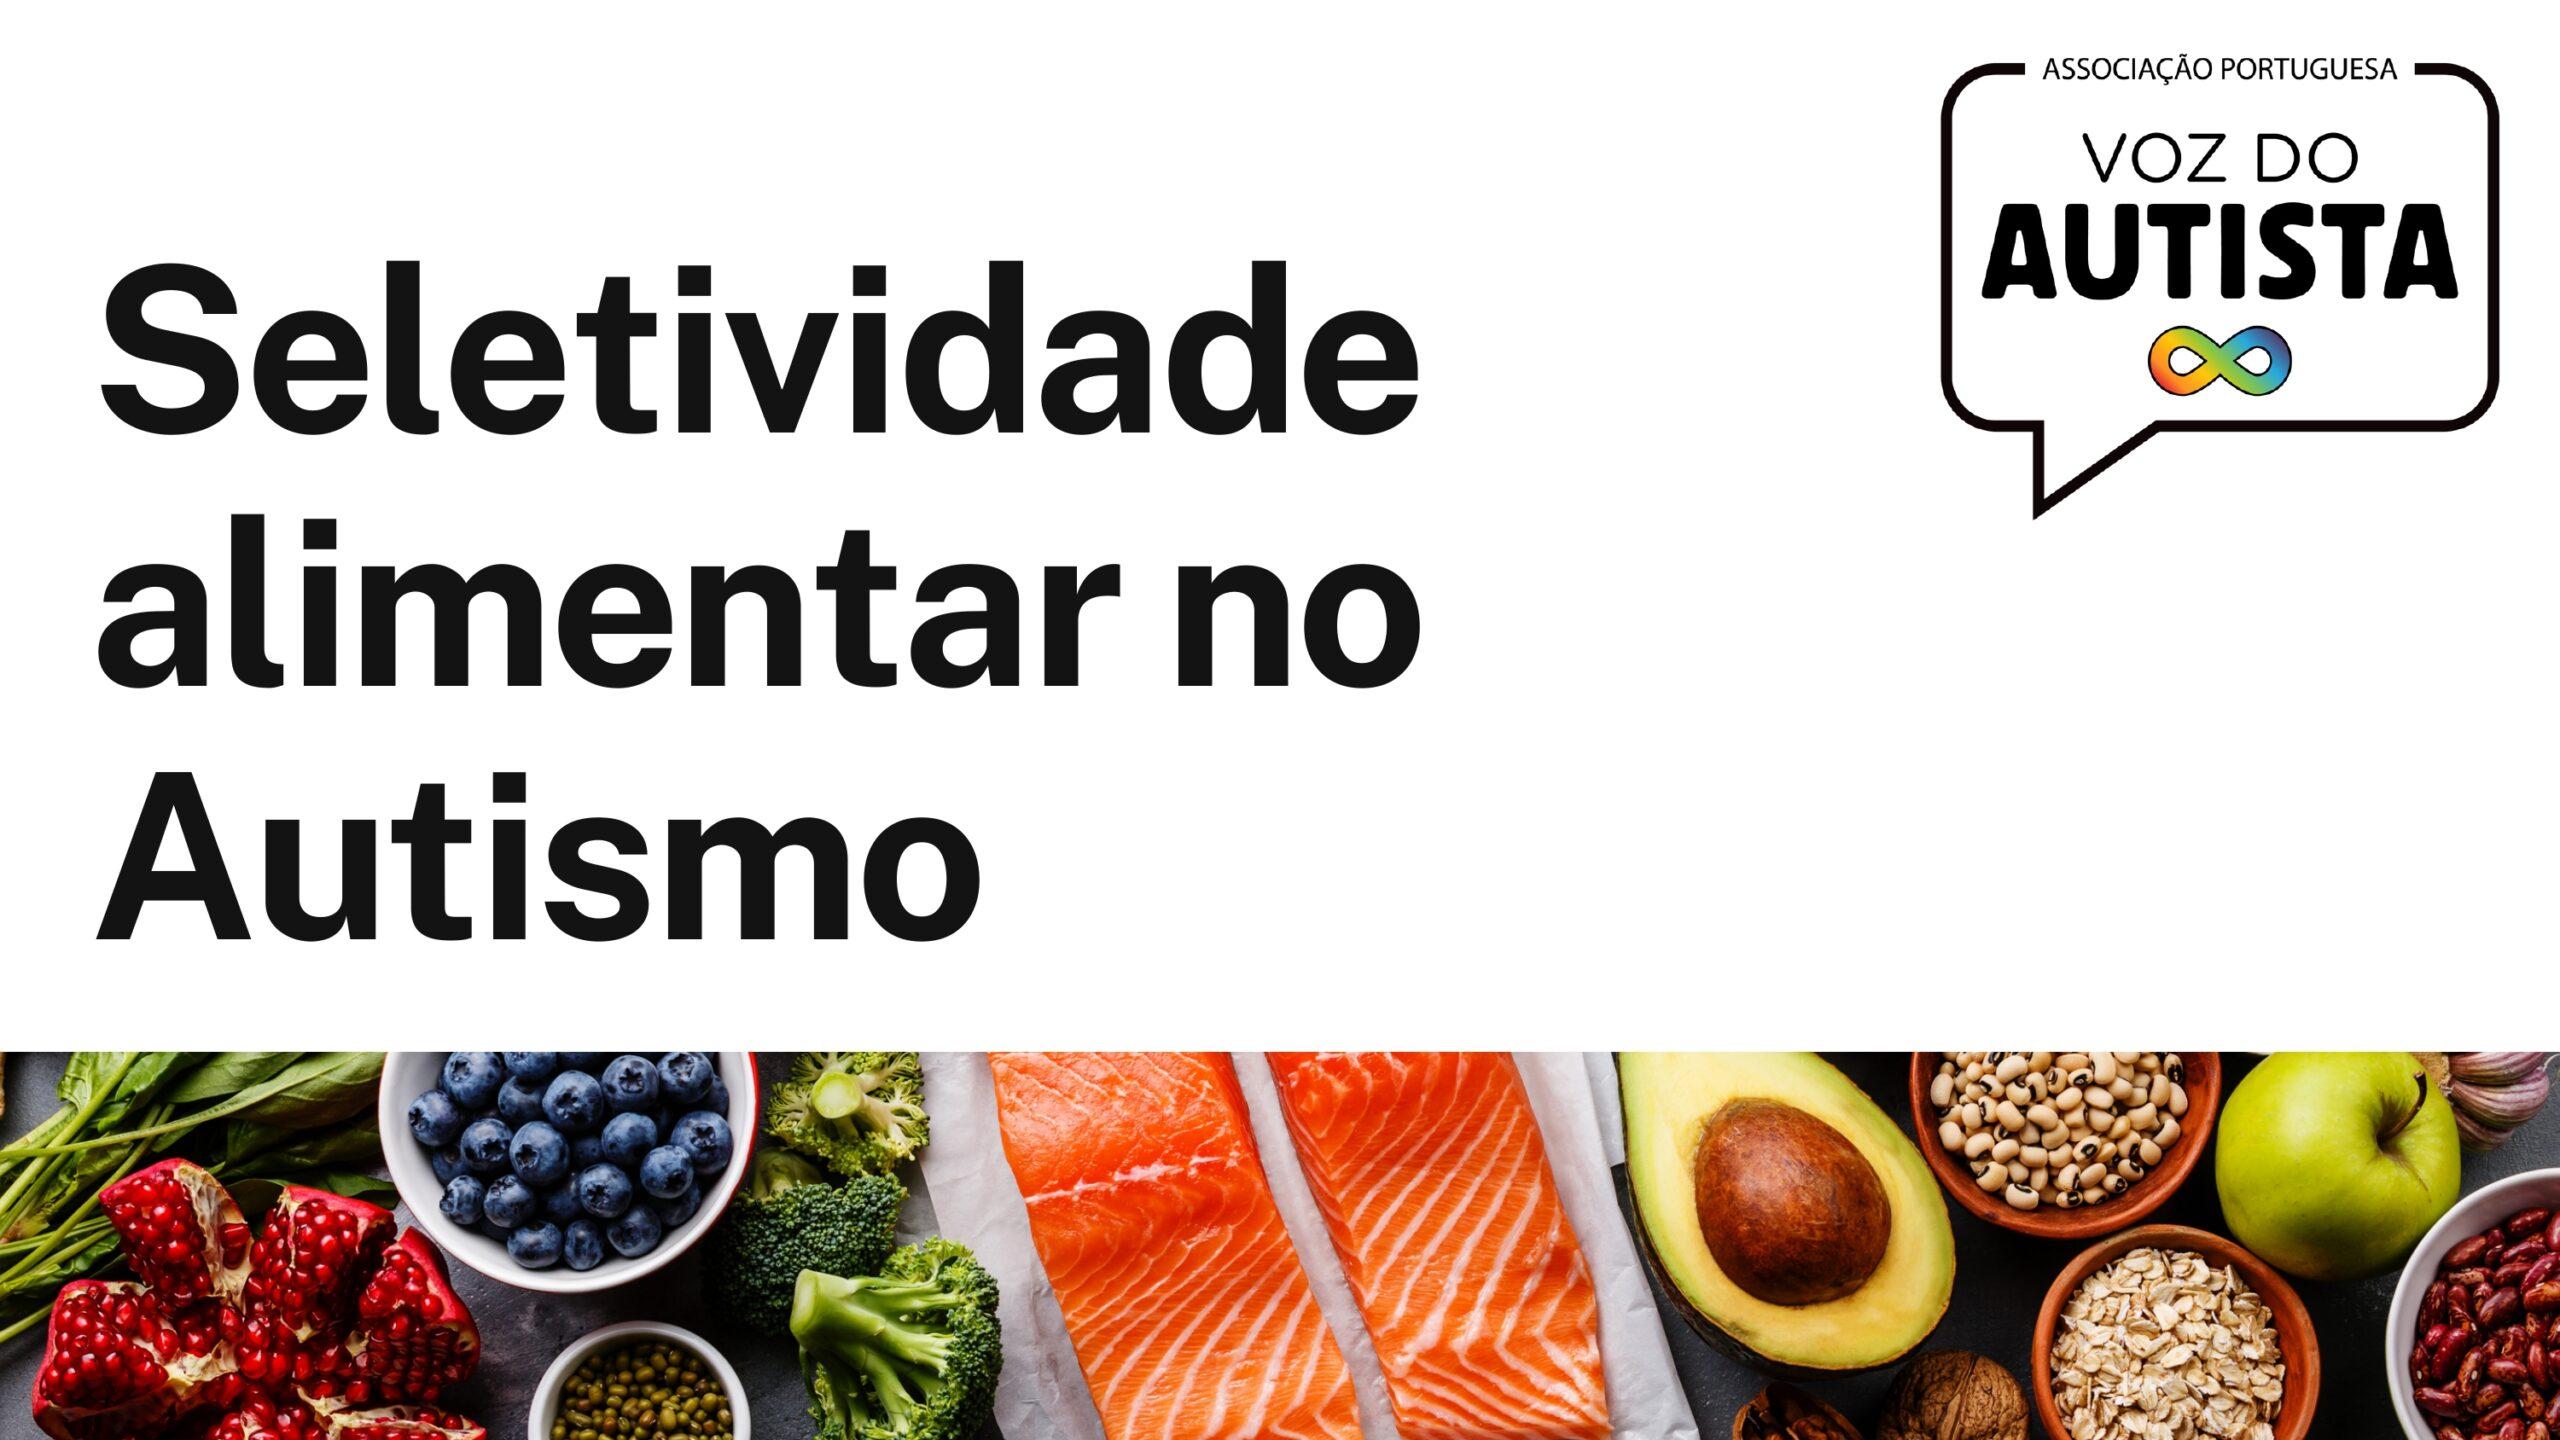 Seletividade alimentar no Autismo (1)_page-0001